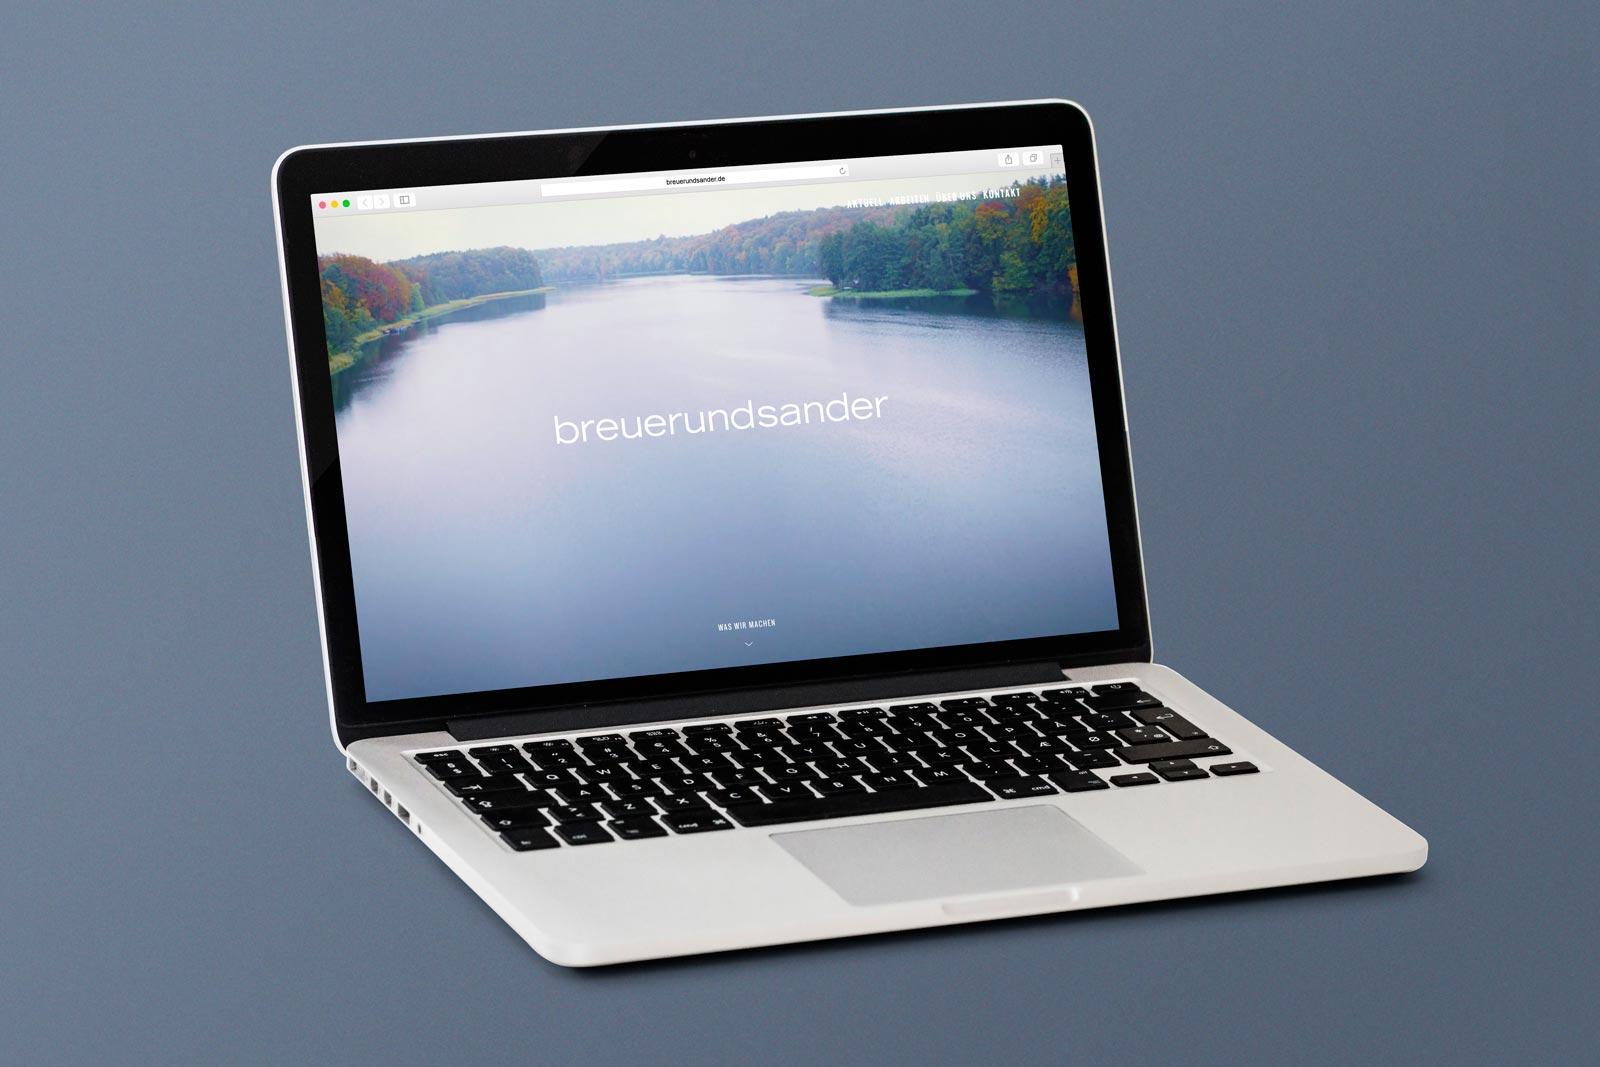 Website breuerundsander